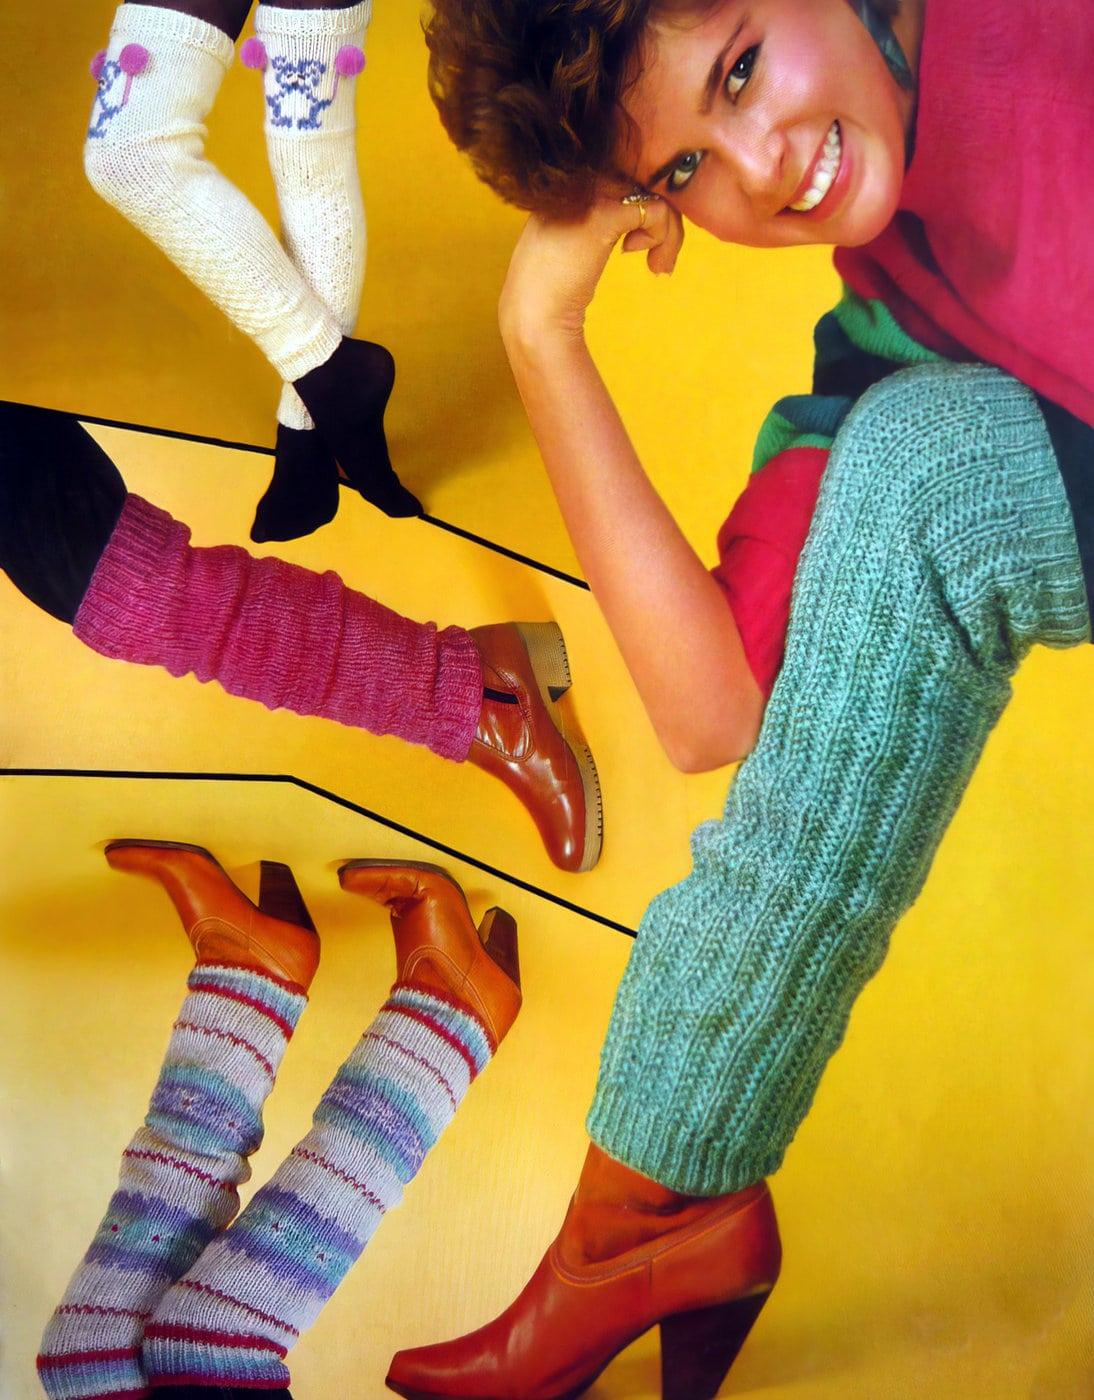 Vintage Bernat leg warmers from the 1980s